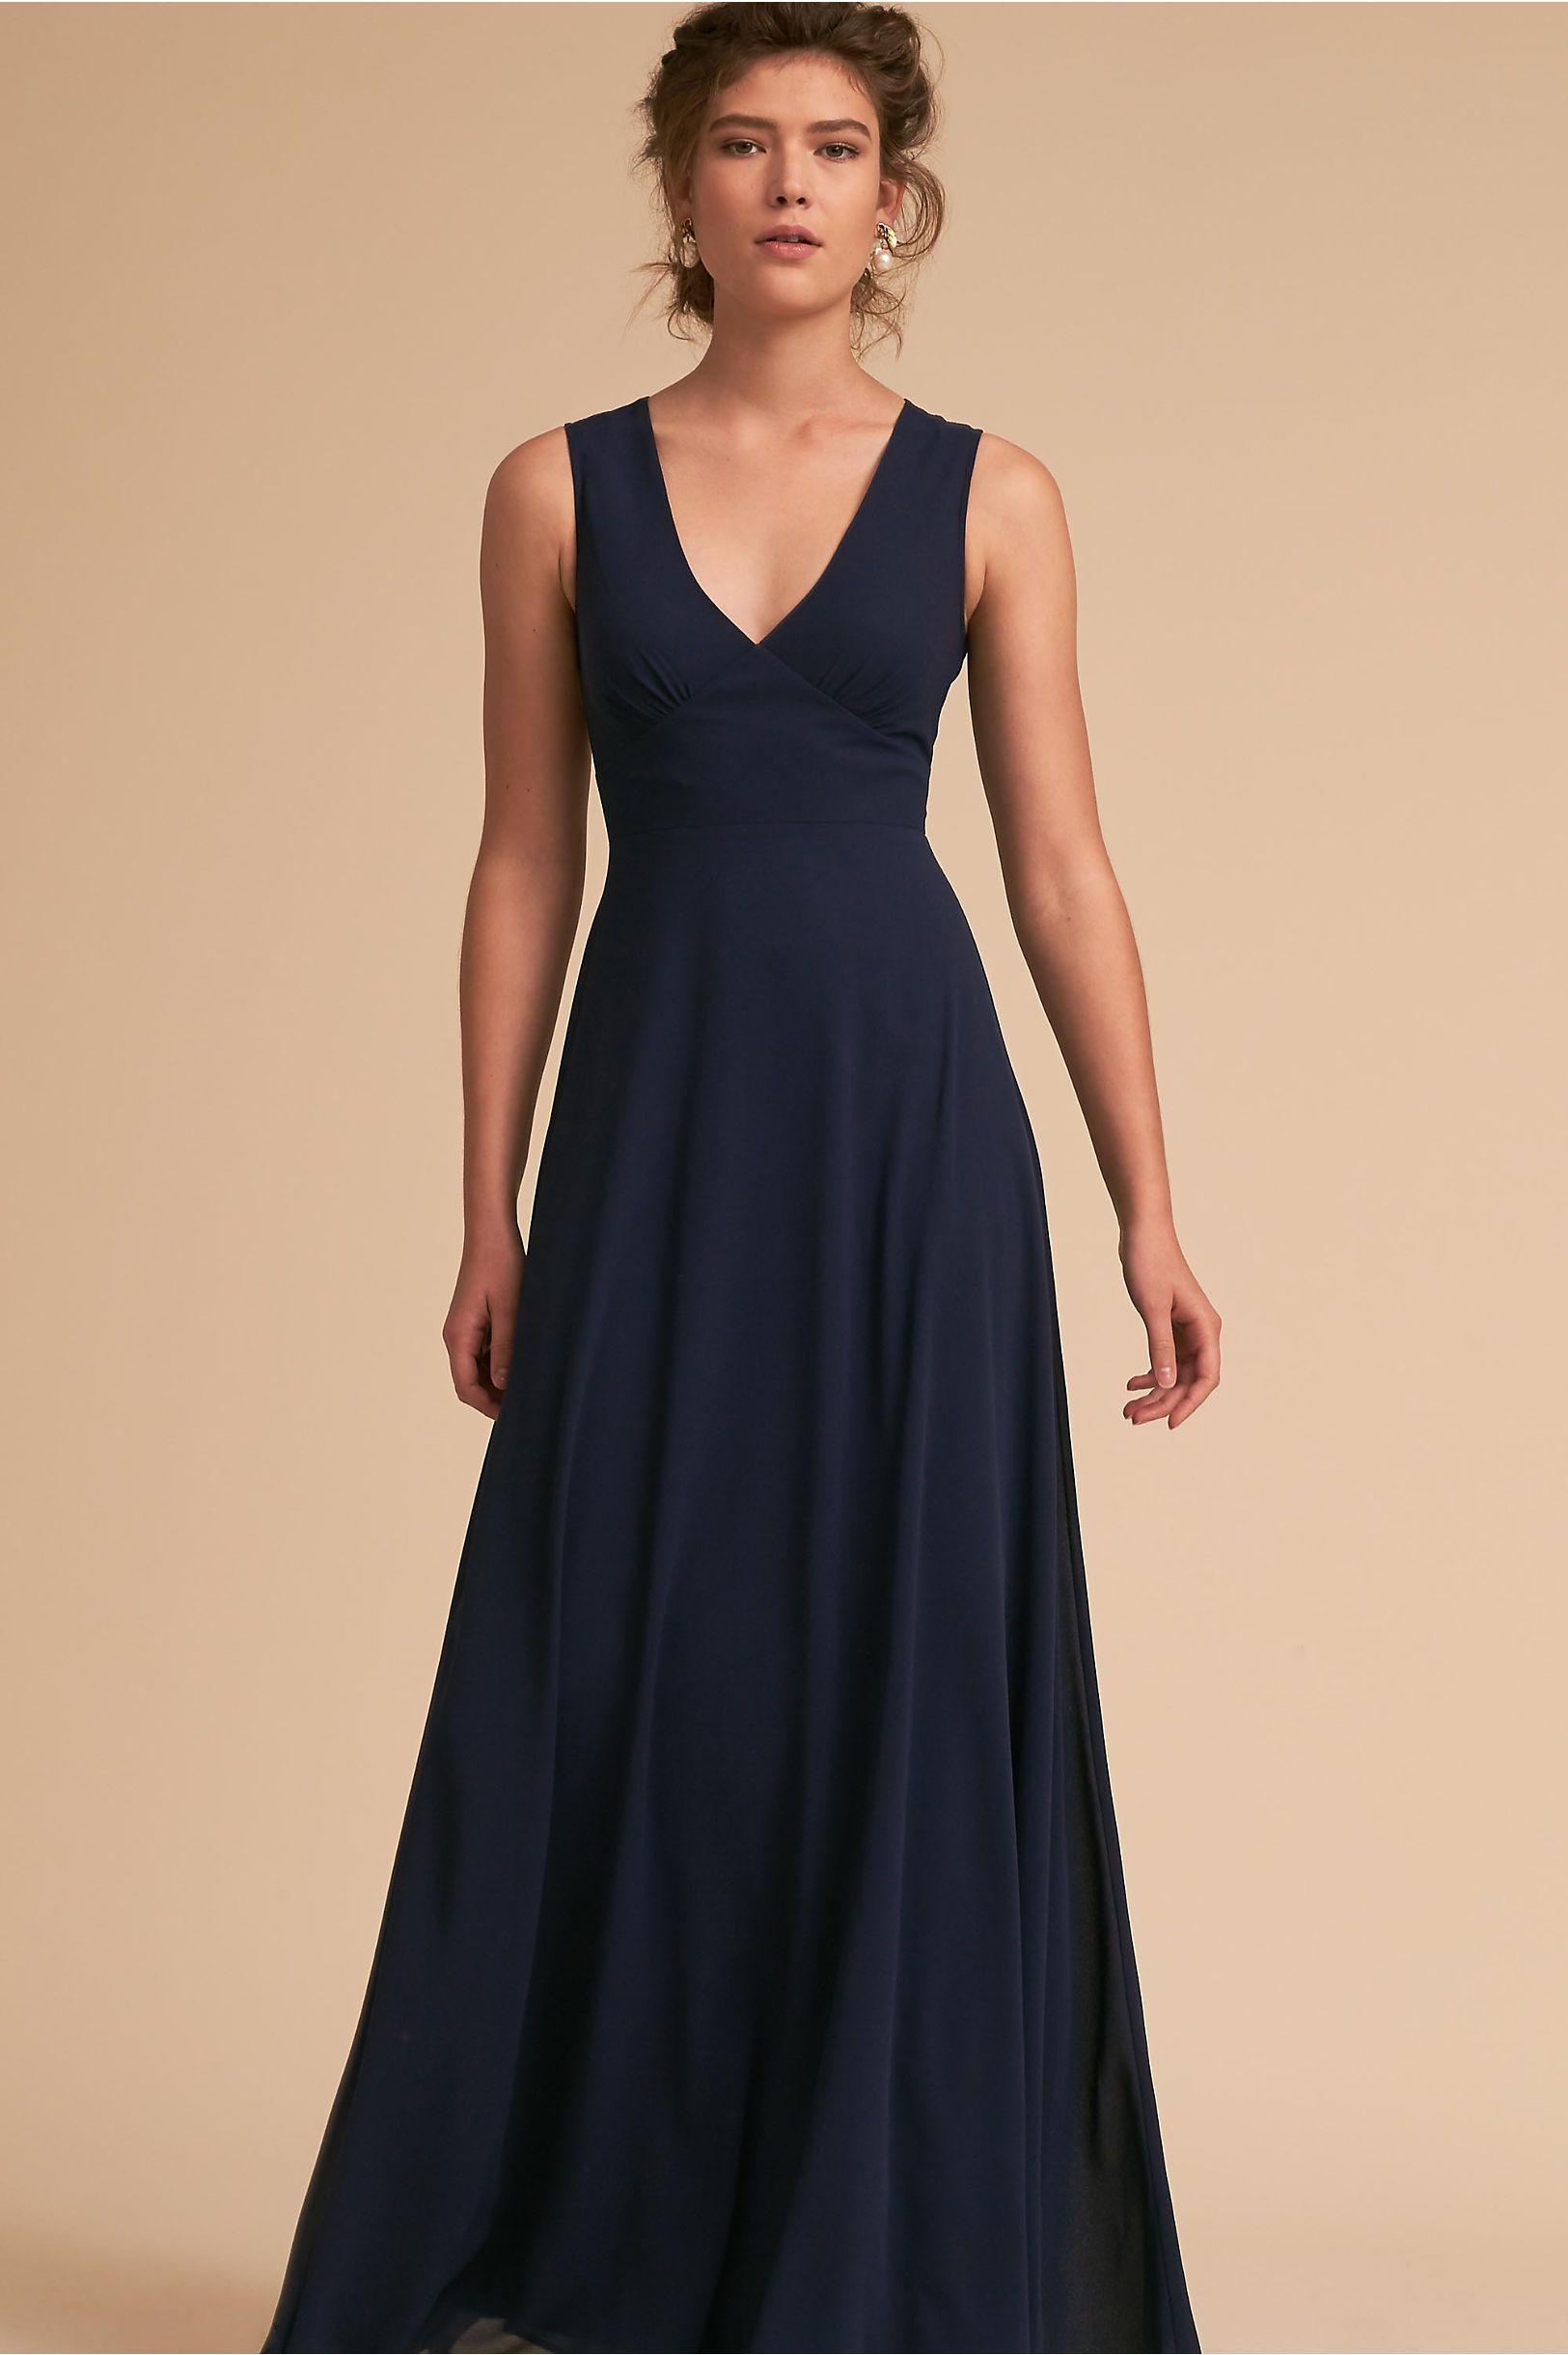 9f9acb659c4 BHLDN Capulet Dress Navy in Bridal Party